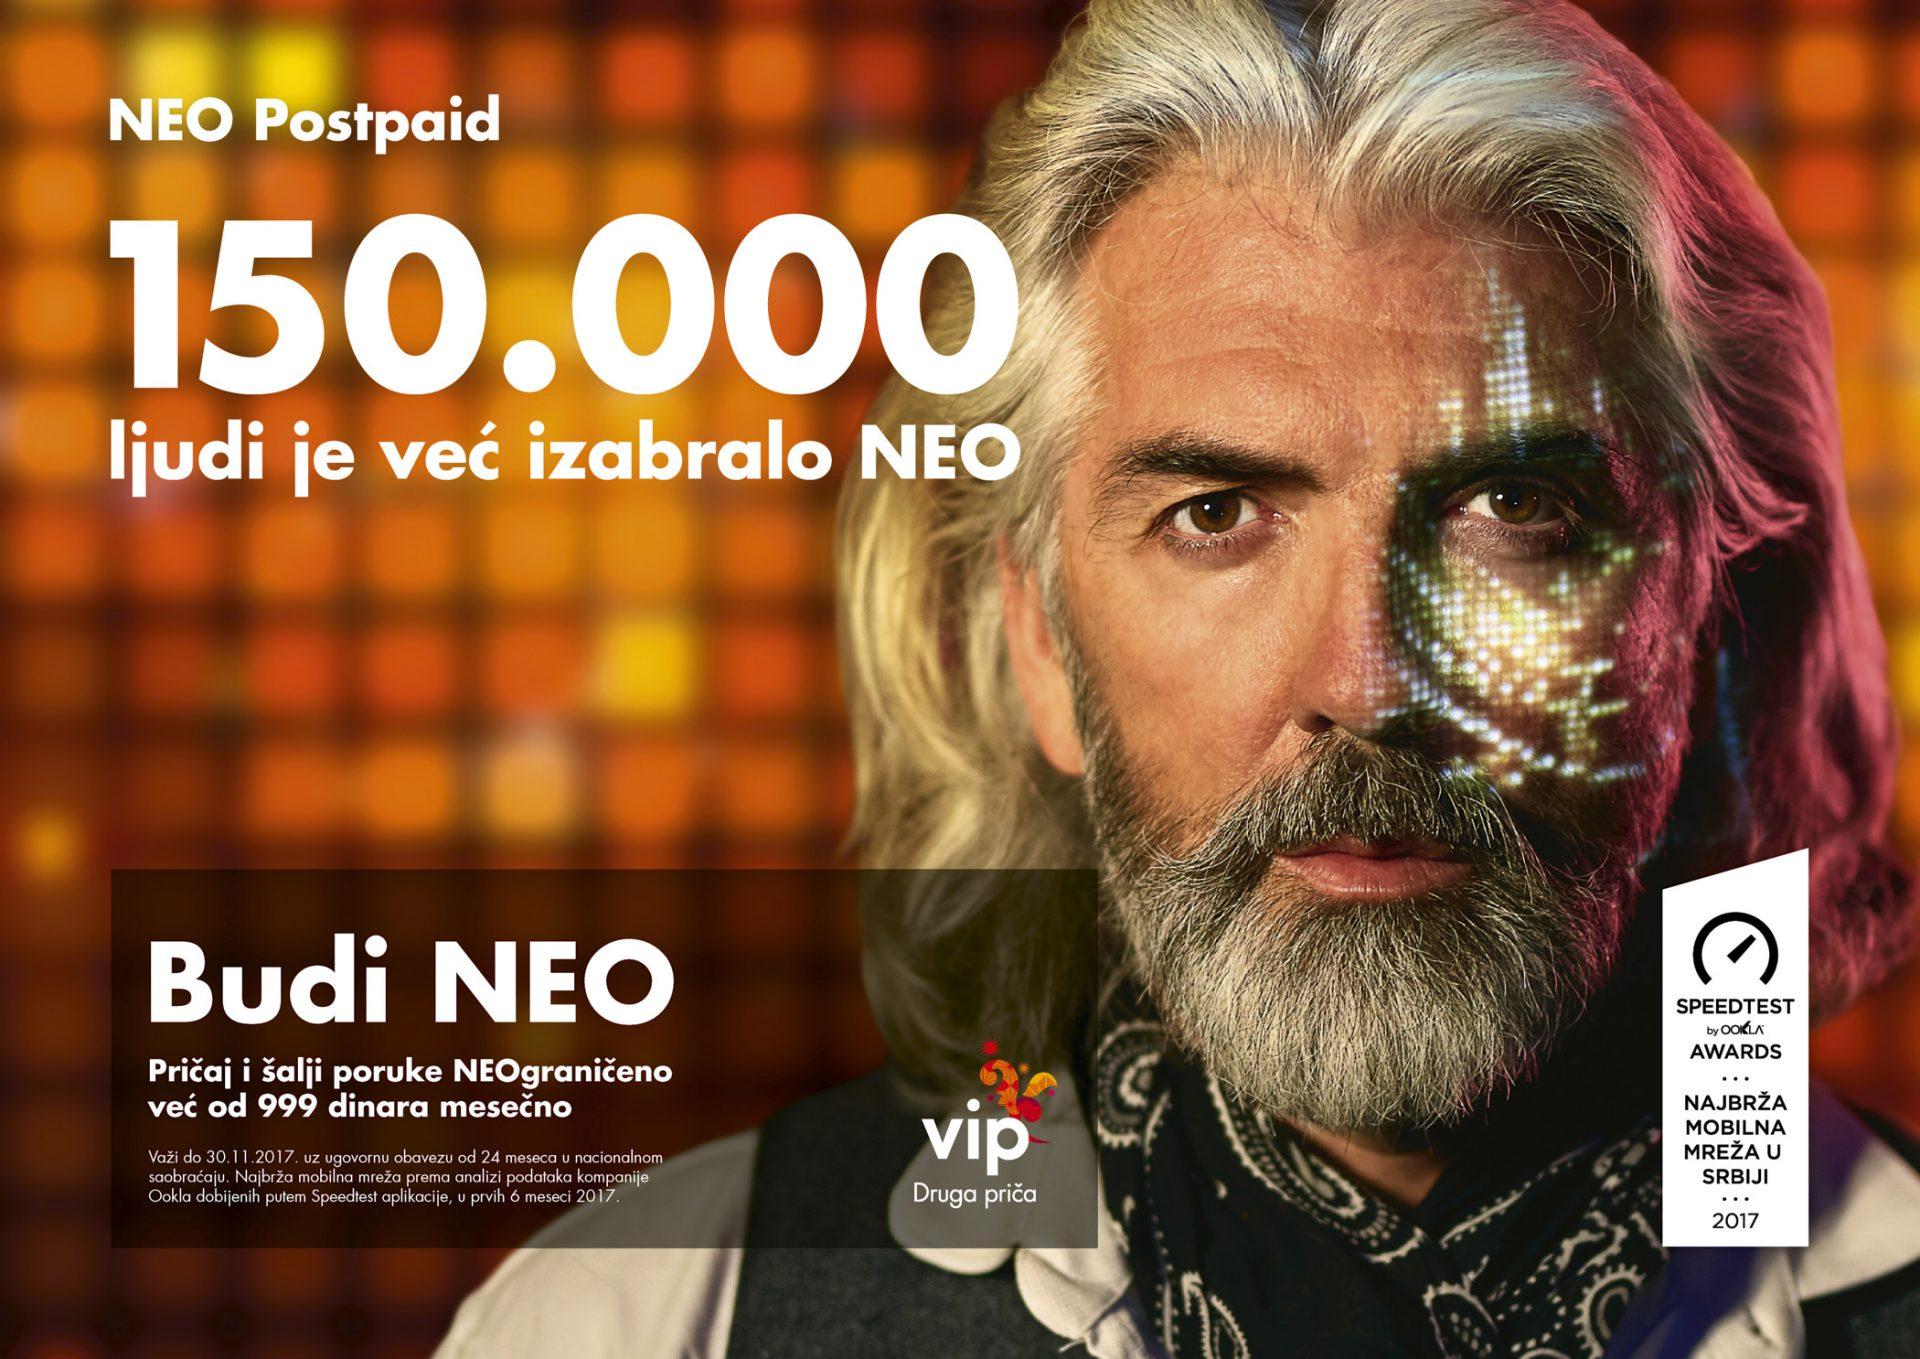 NEO-2.0_A0-poster-DJ-150k